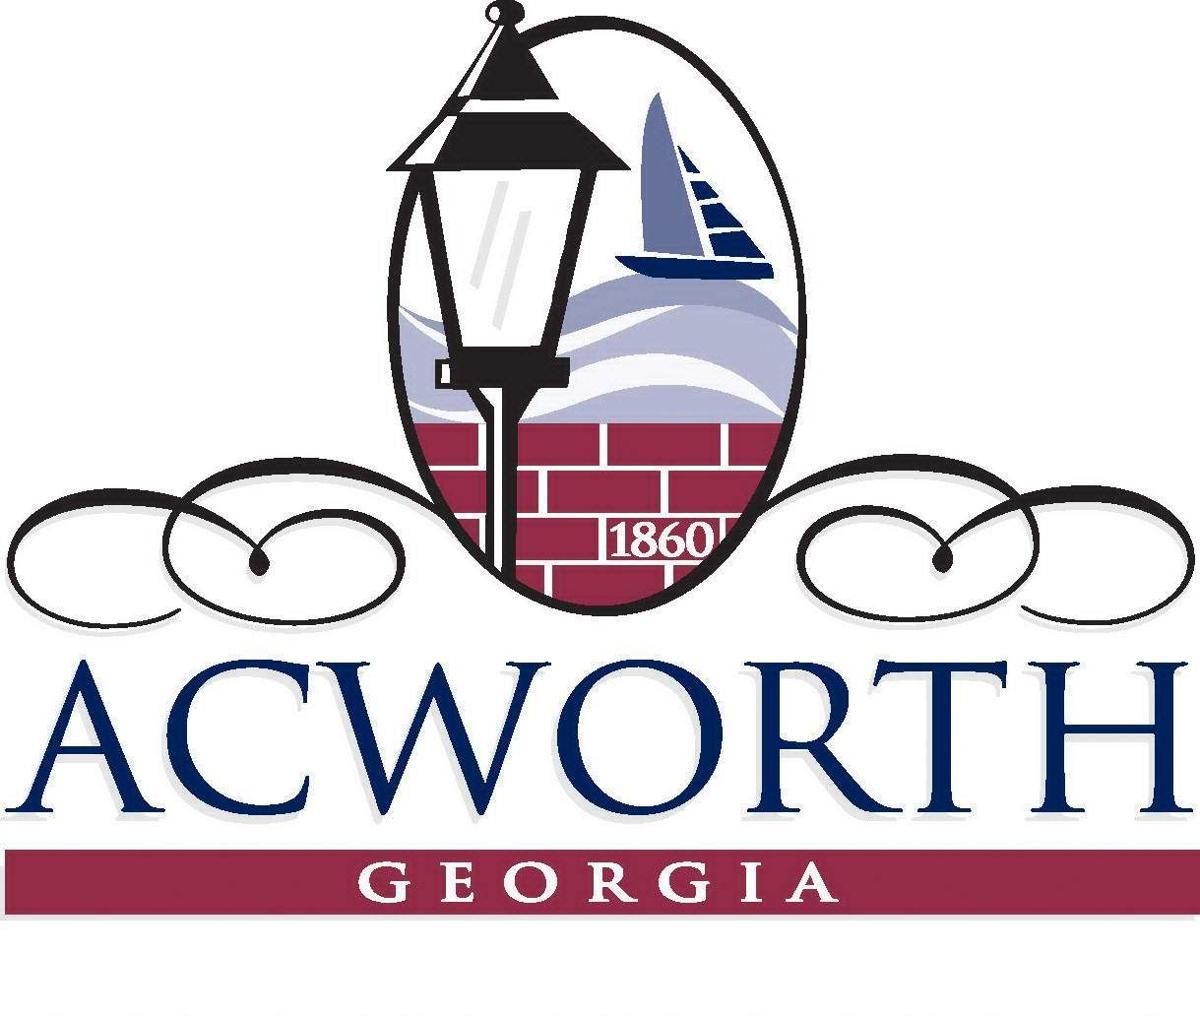 acworth logo.jpg